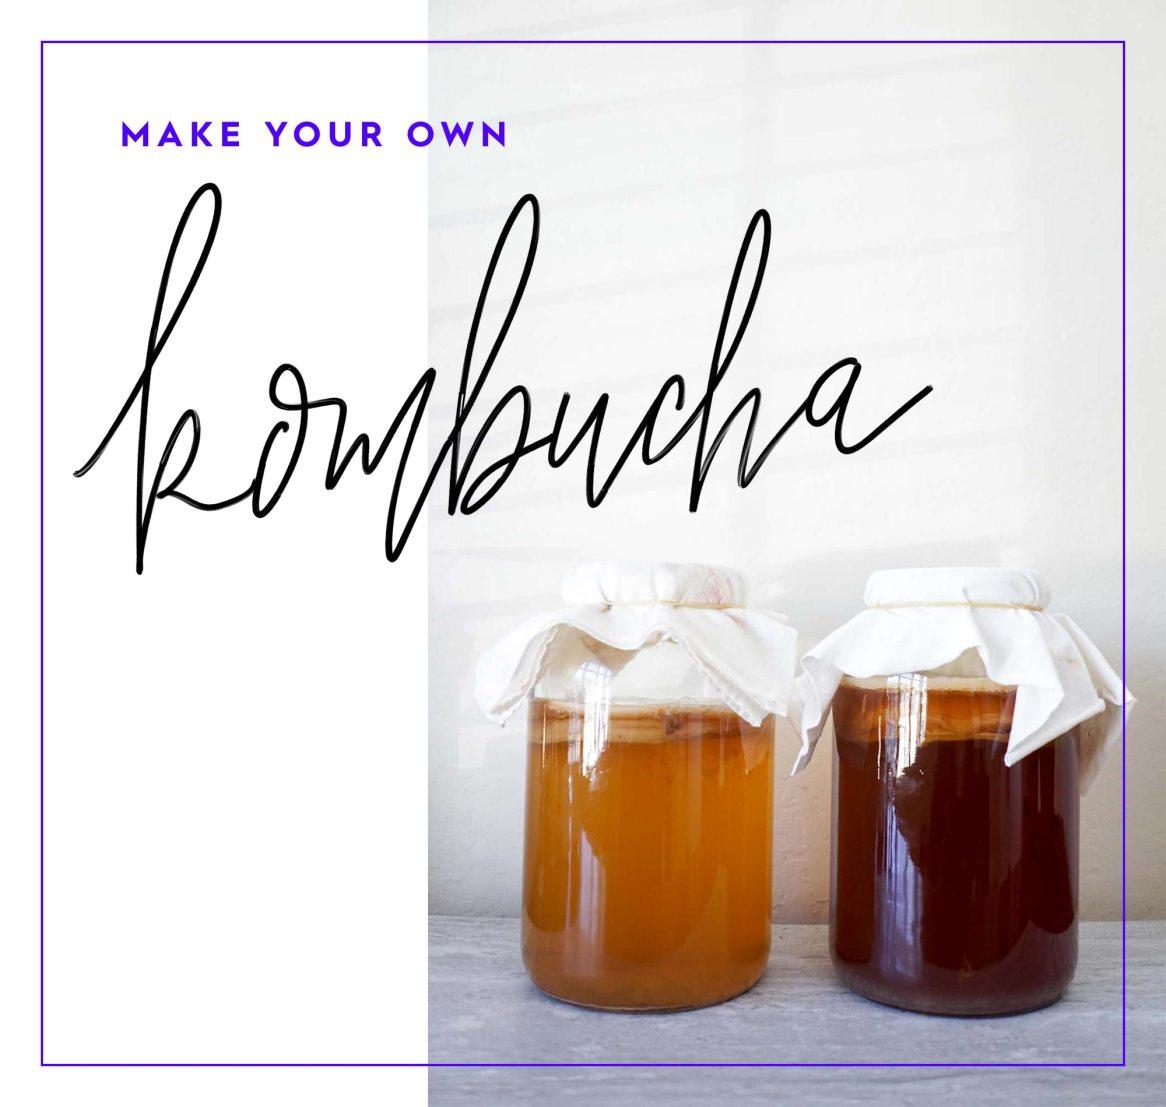 kombucha-title1